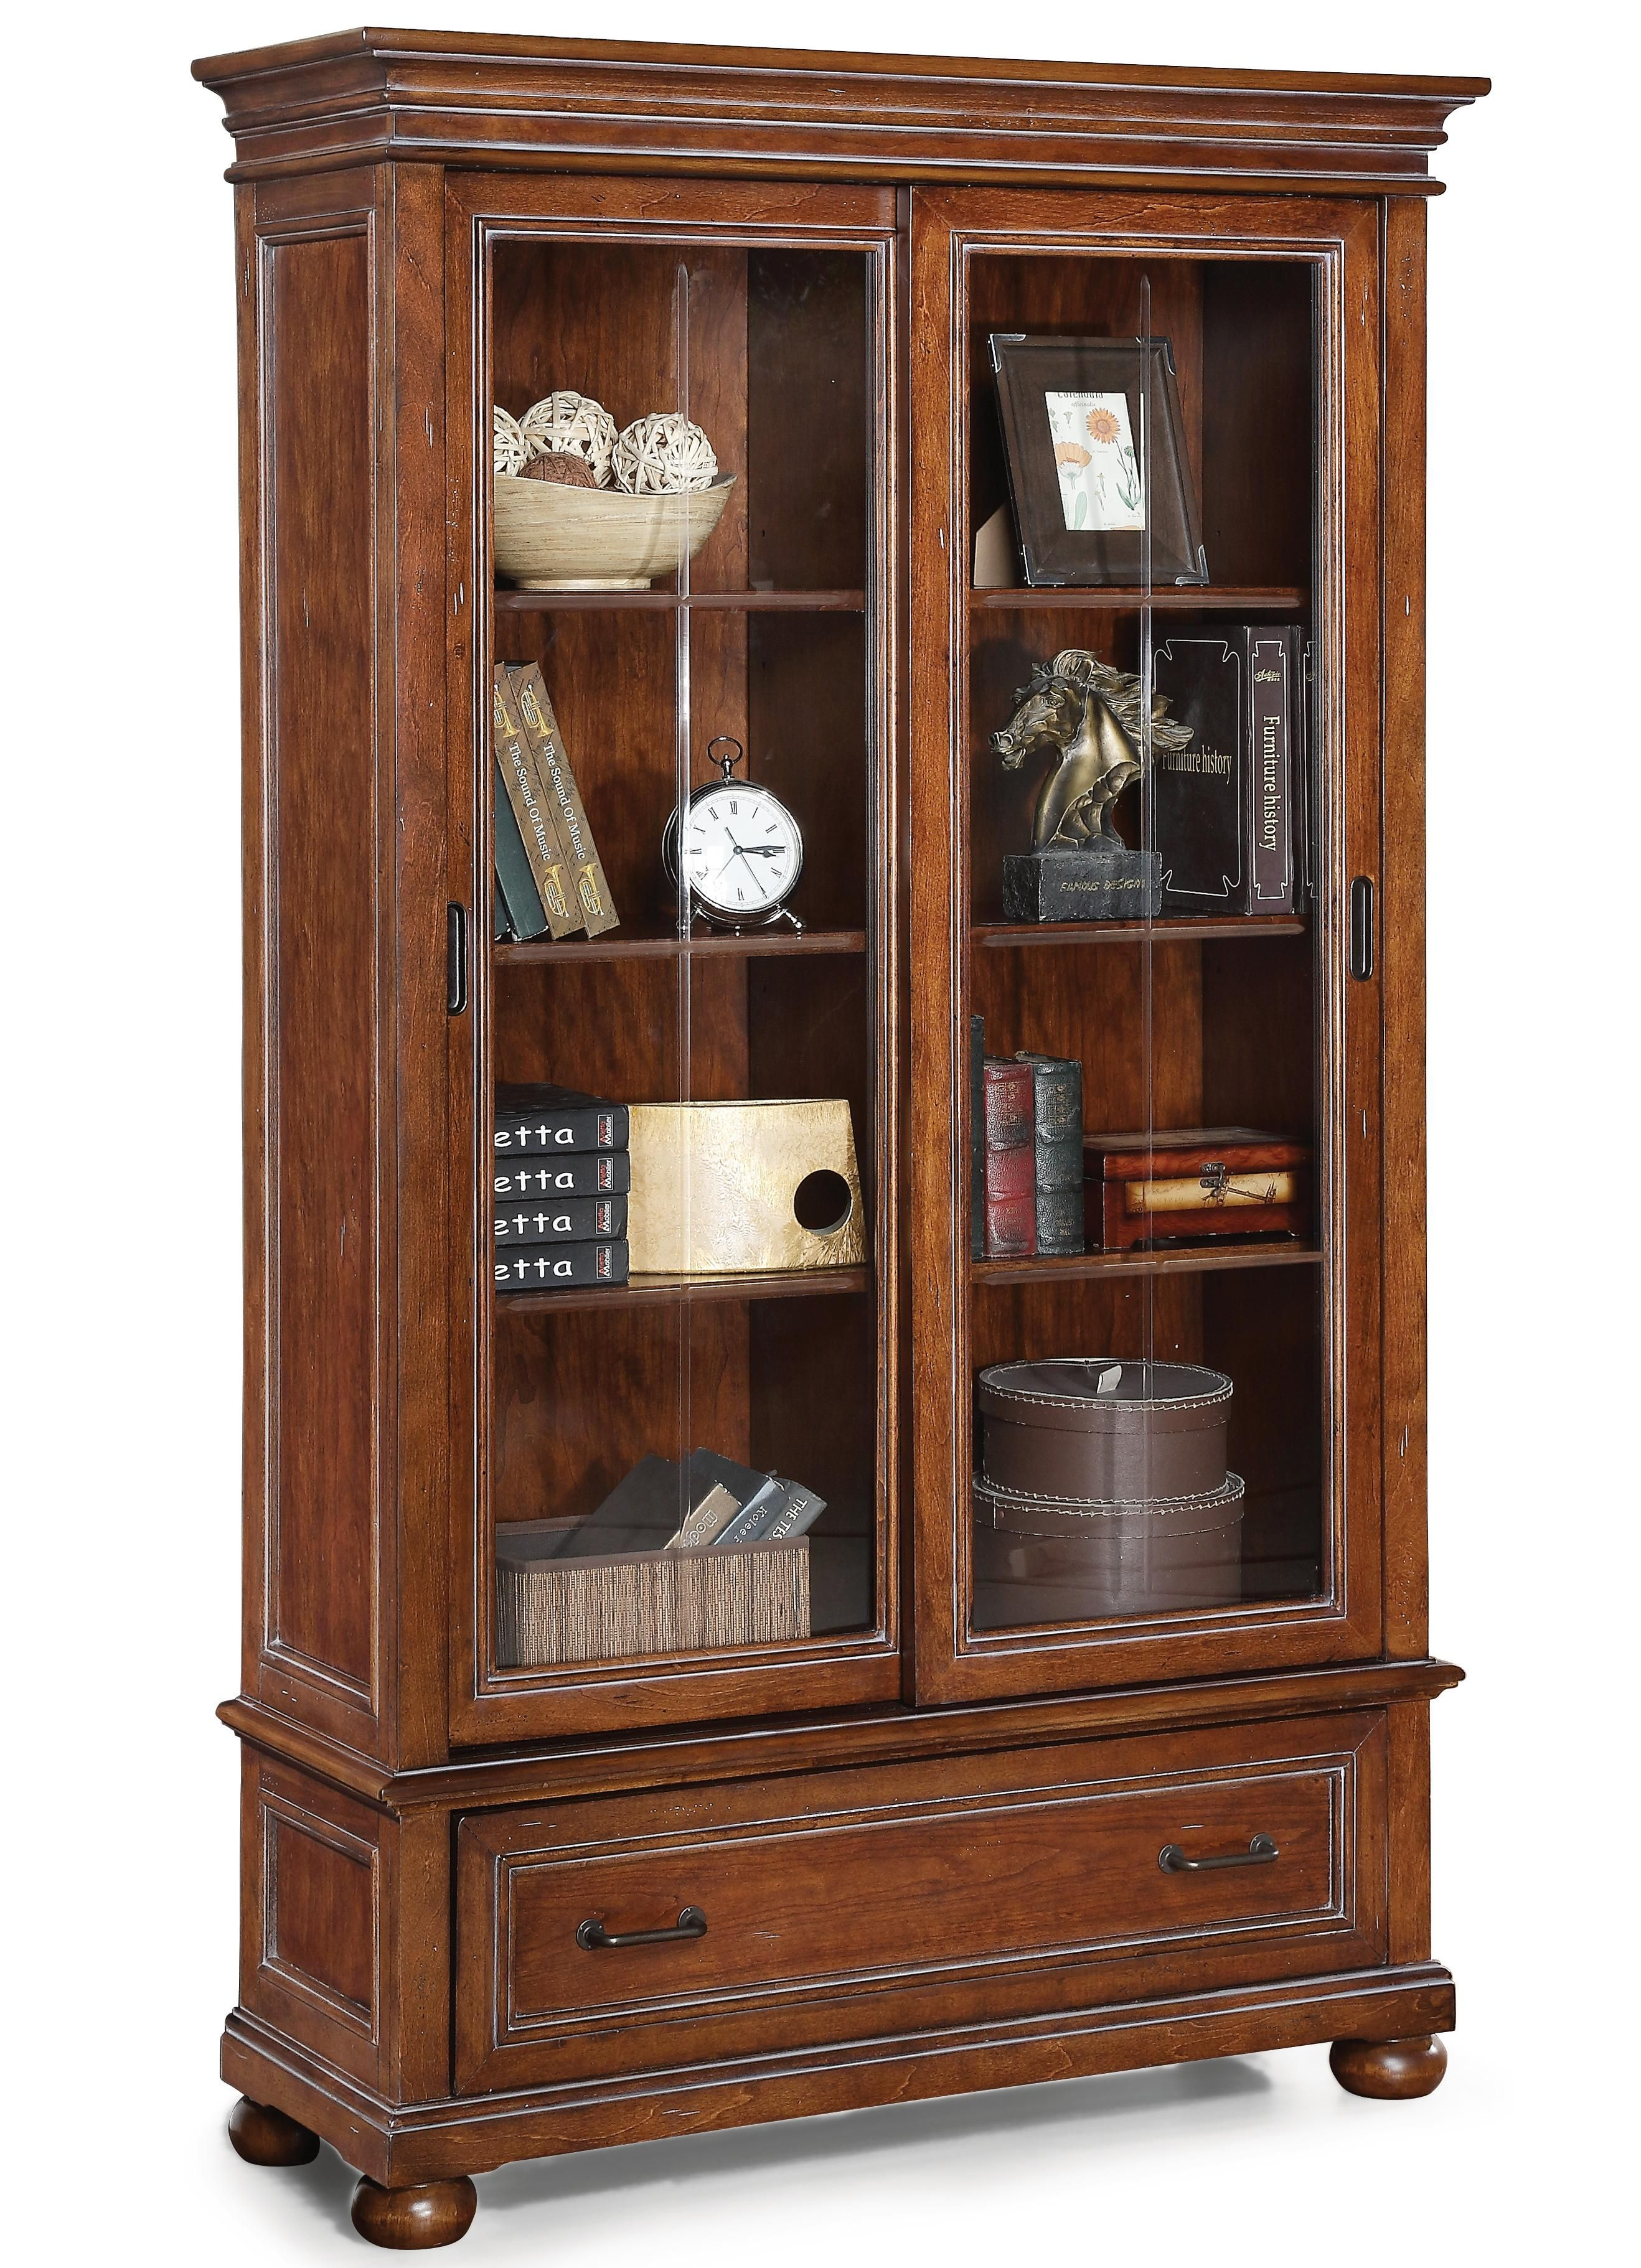 Beau Shop For The Flexsteel Wynwood Collection American Heritage Sliding Door  Bookcase At Stegeru0027s Furniture   Your Peoria, Pekin, Bloomington, U0026 Morton,  IL ...